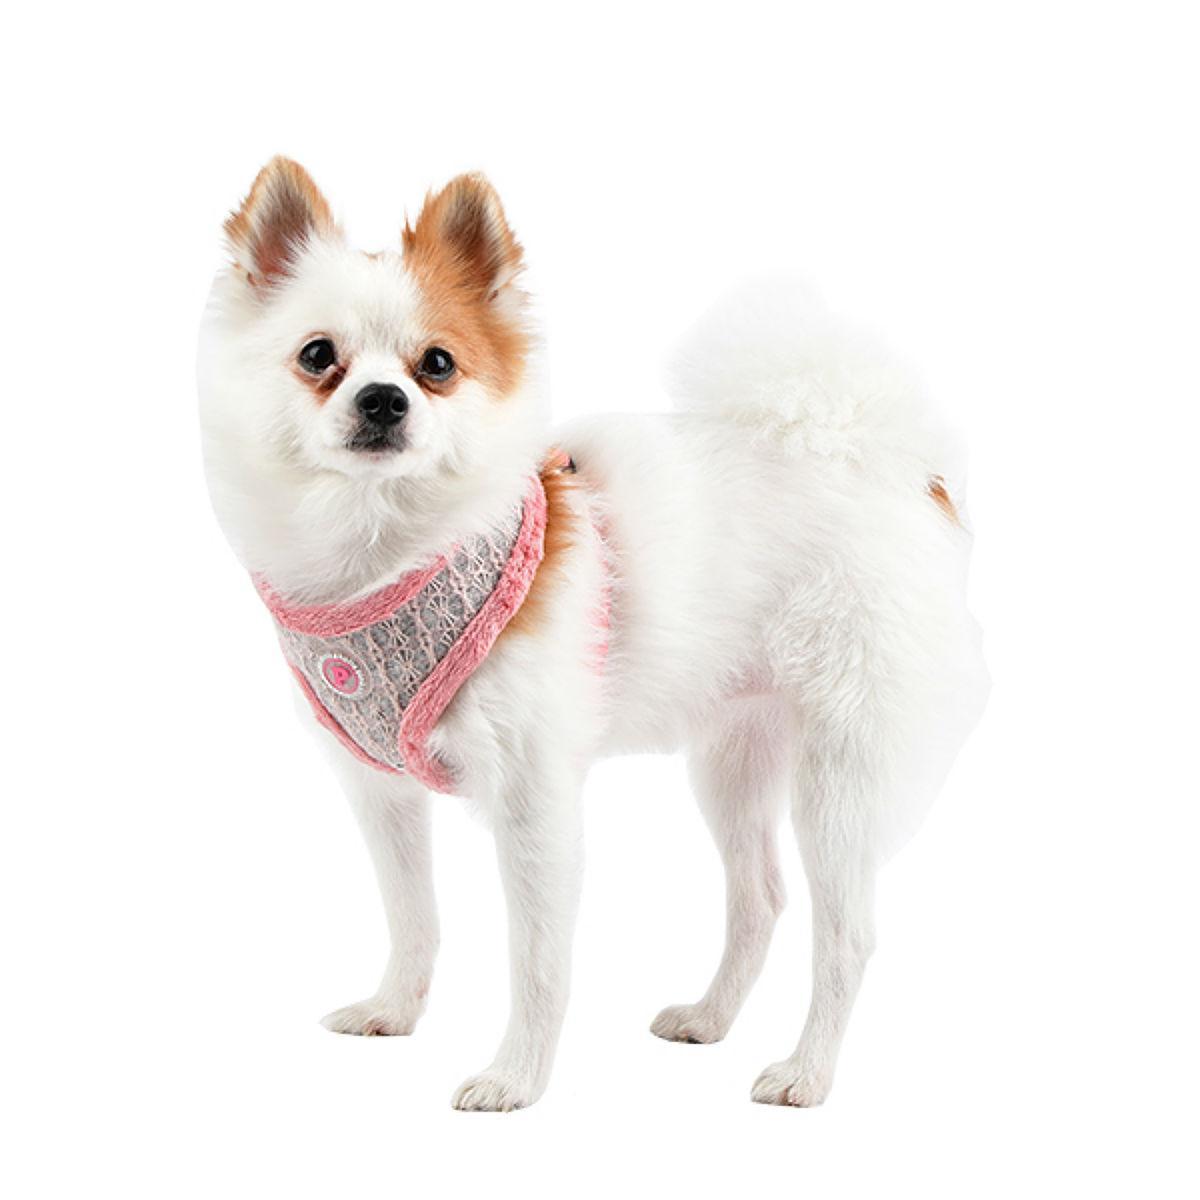 Margaux Basic Style Dog Harness By Pinkaholic - Pink